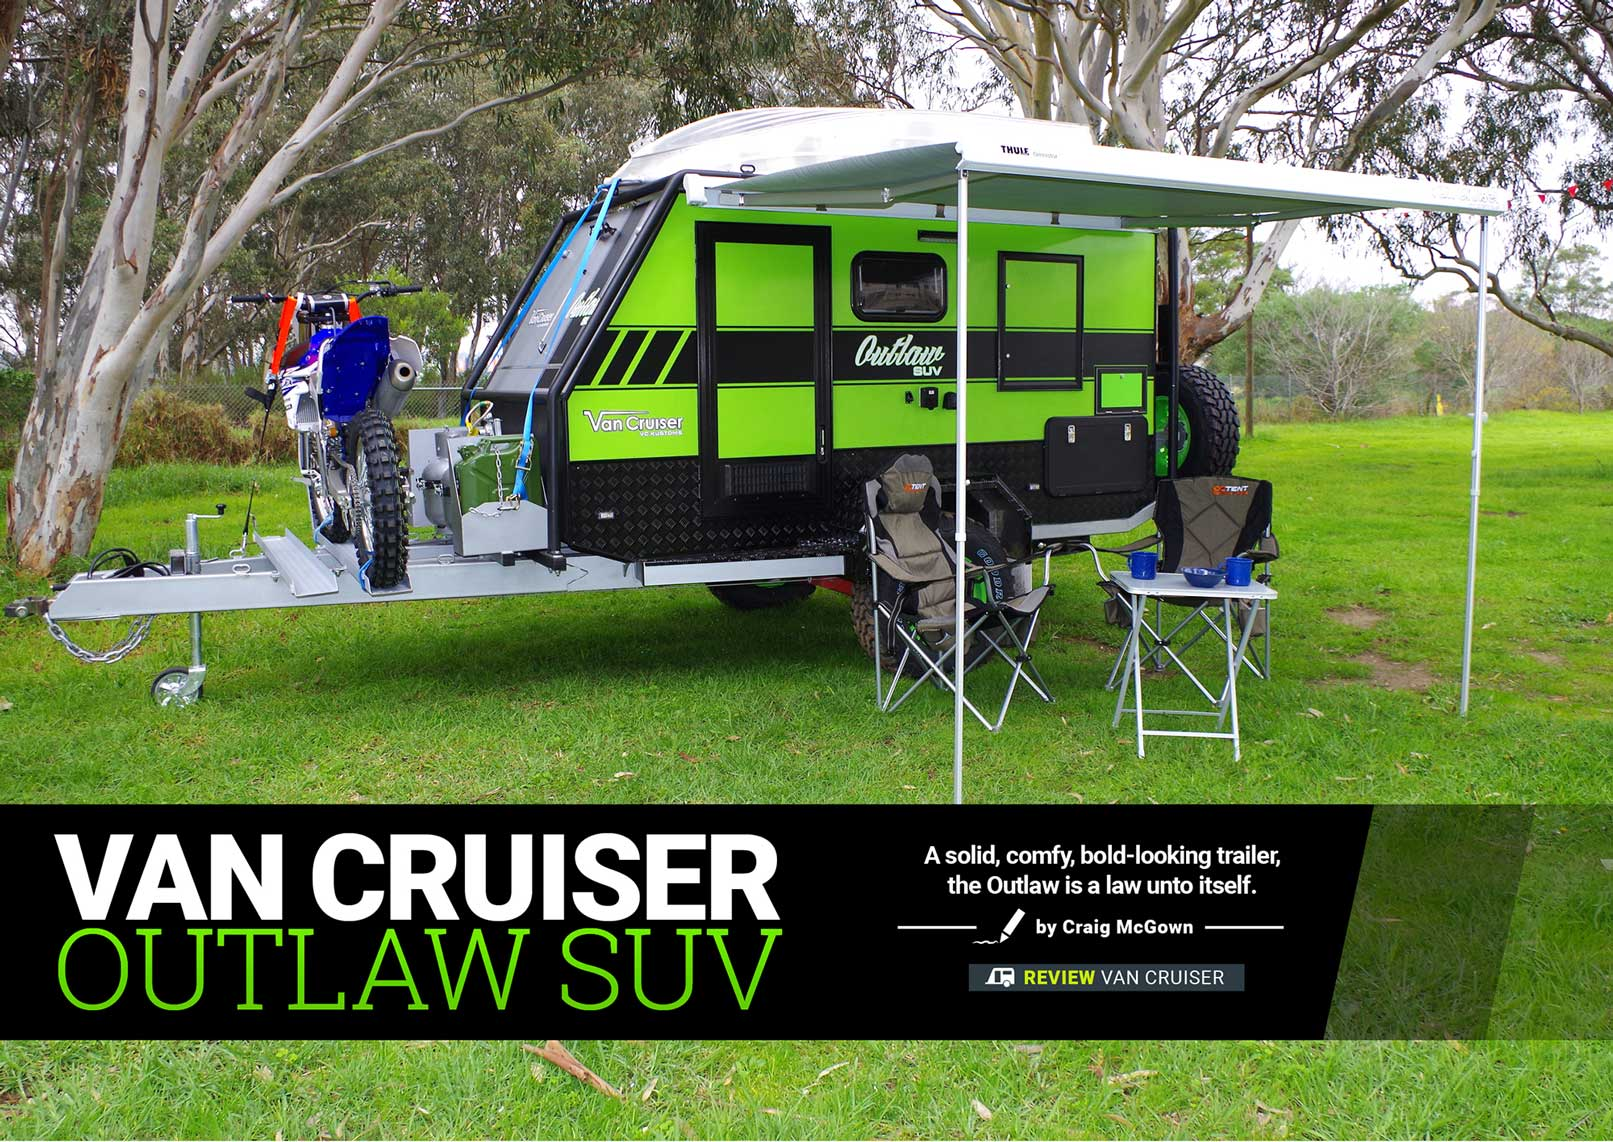 Van Cruiser Outlaw SUV